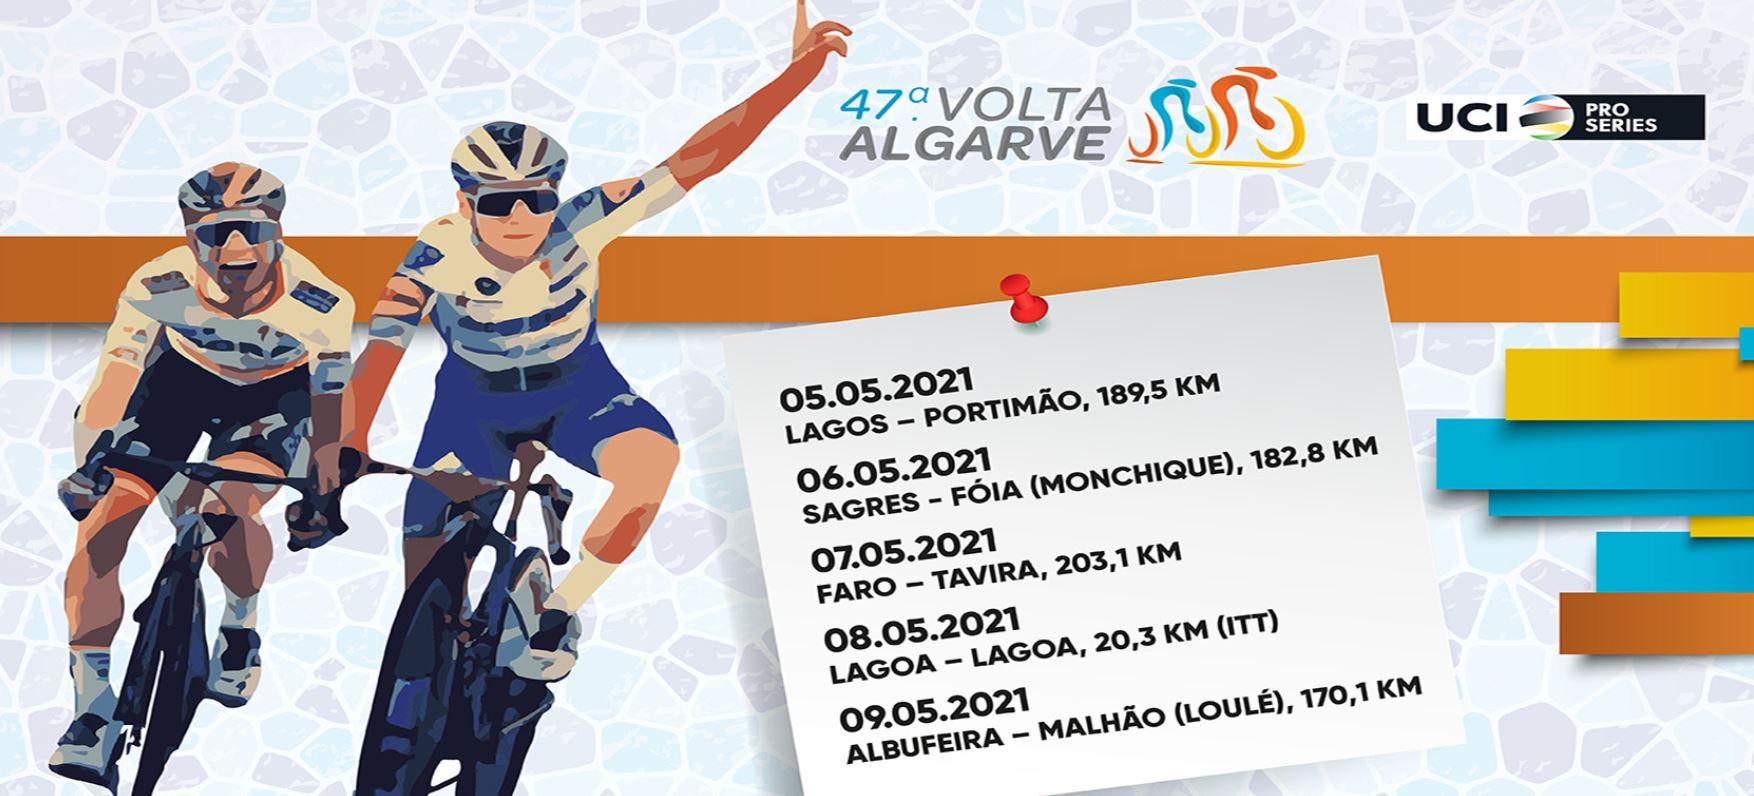 Volta ao Algarve returns in May